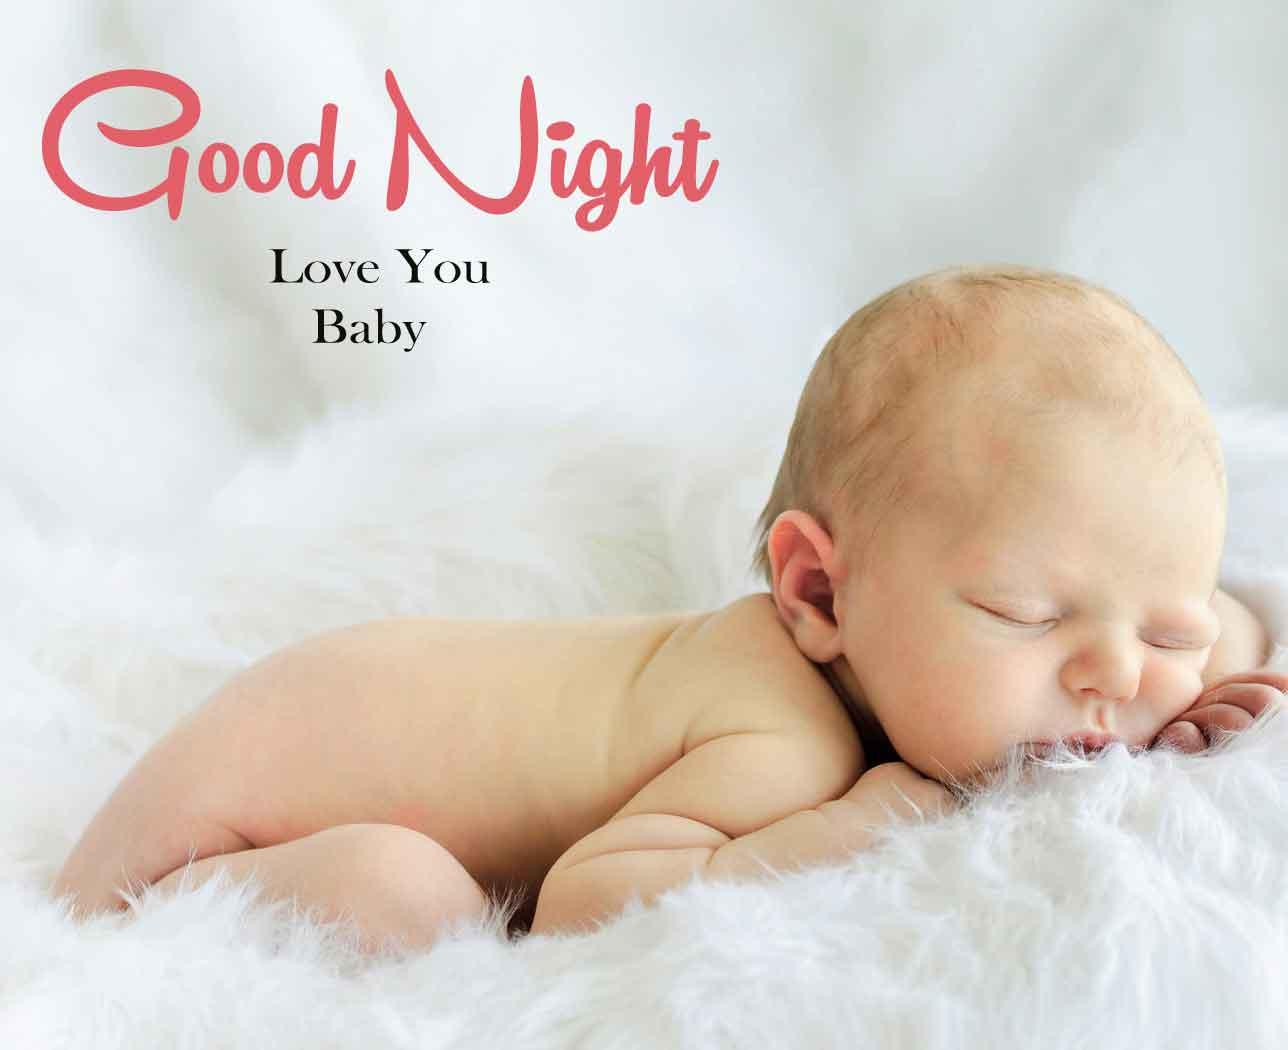 good night cute baby Pics Free 2